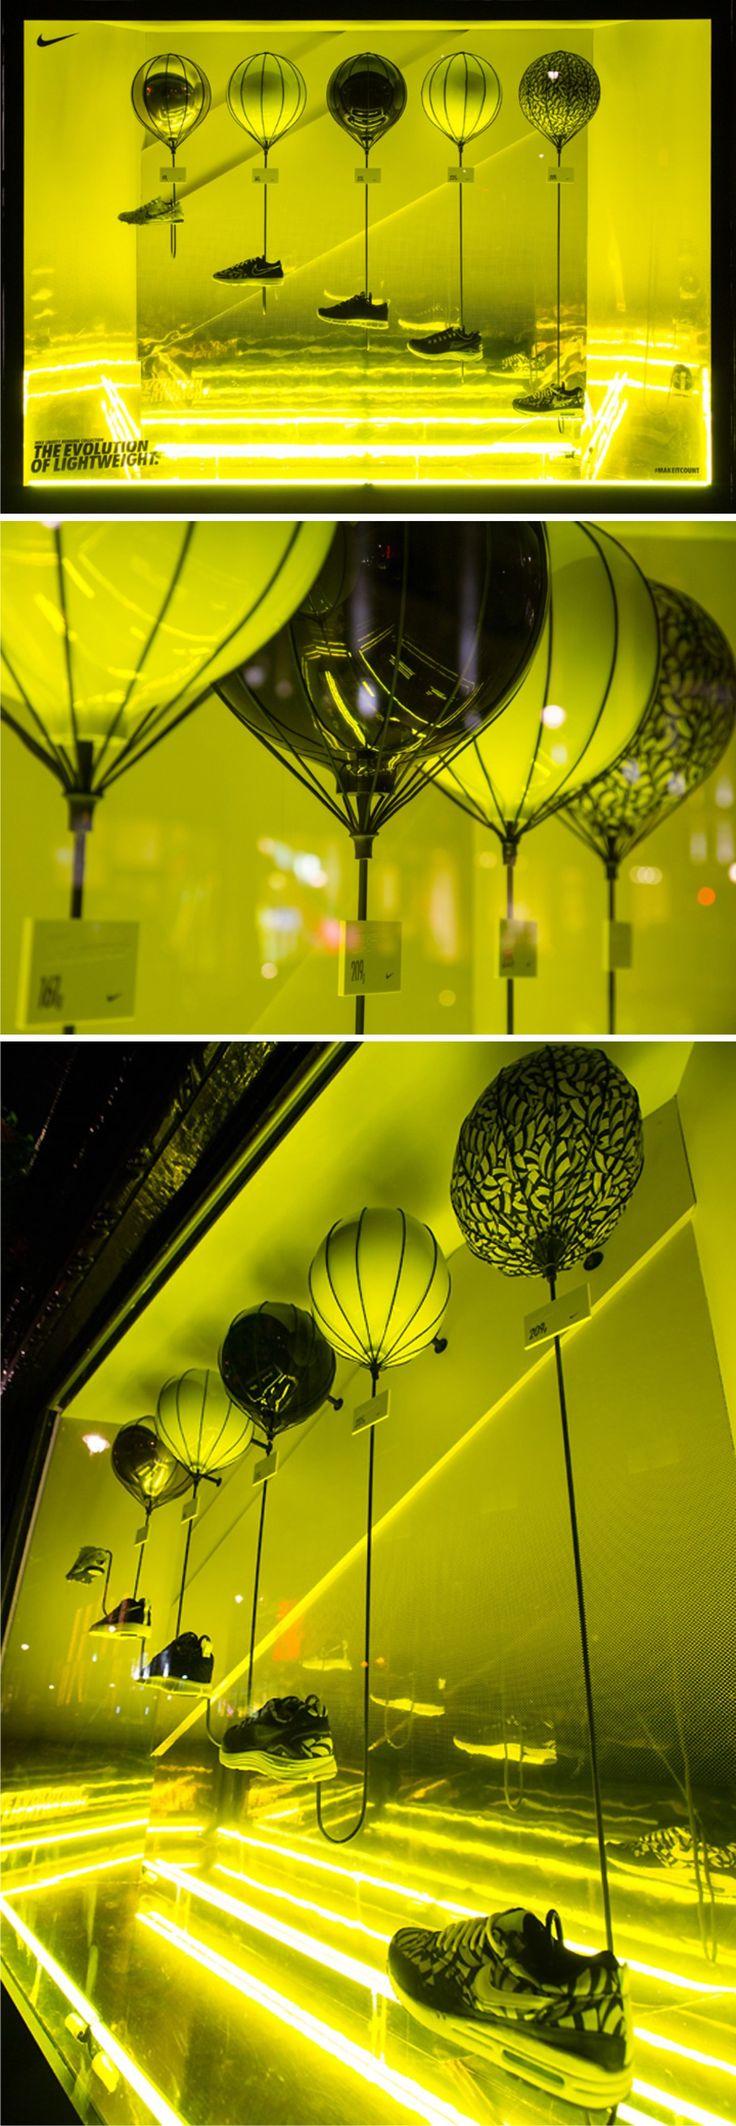 Nike x Liberty windows by Hotel Creative, London. retaildesignblog....